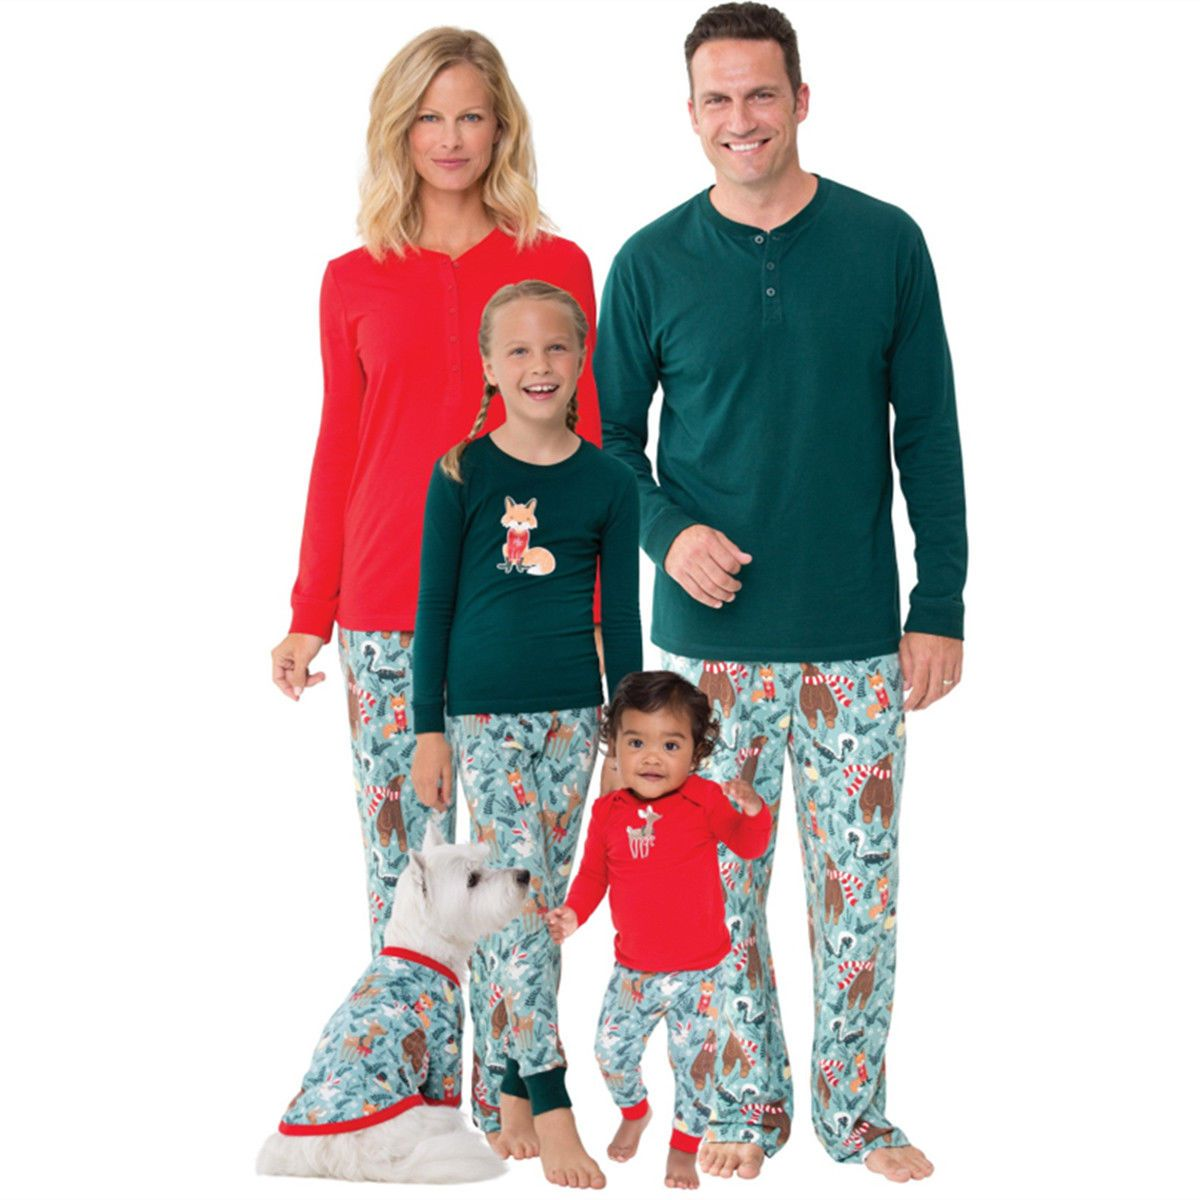 dd90f83793  9.99 - Us Family Matching Christmas Pajamas Set Women Men Kids Sleepwear  Nightwear Hot  ebay  Fashion